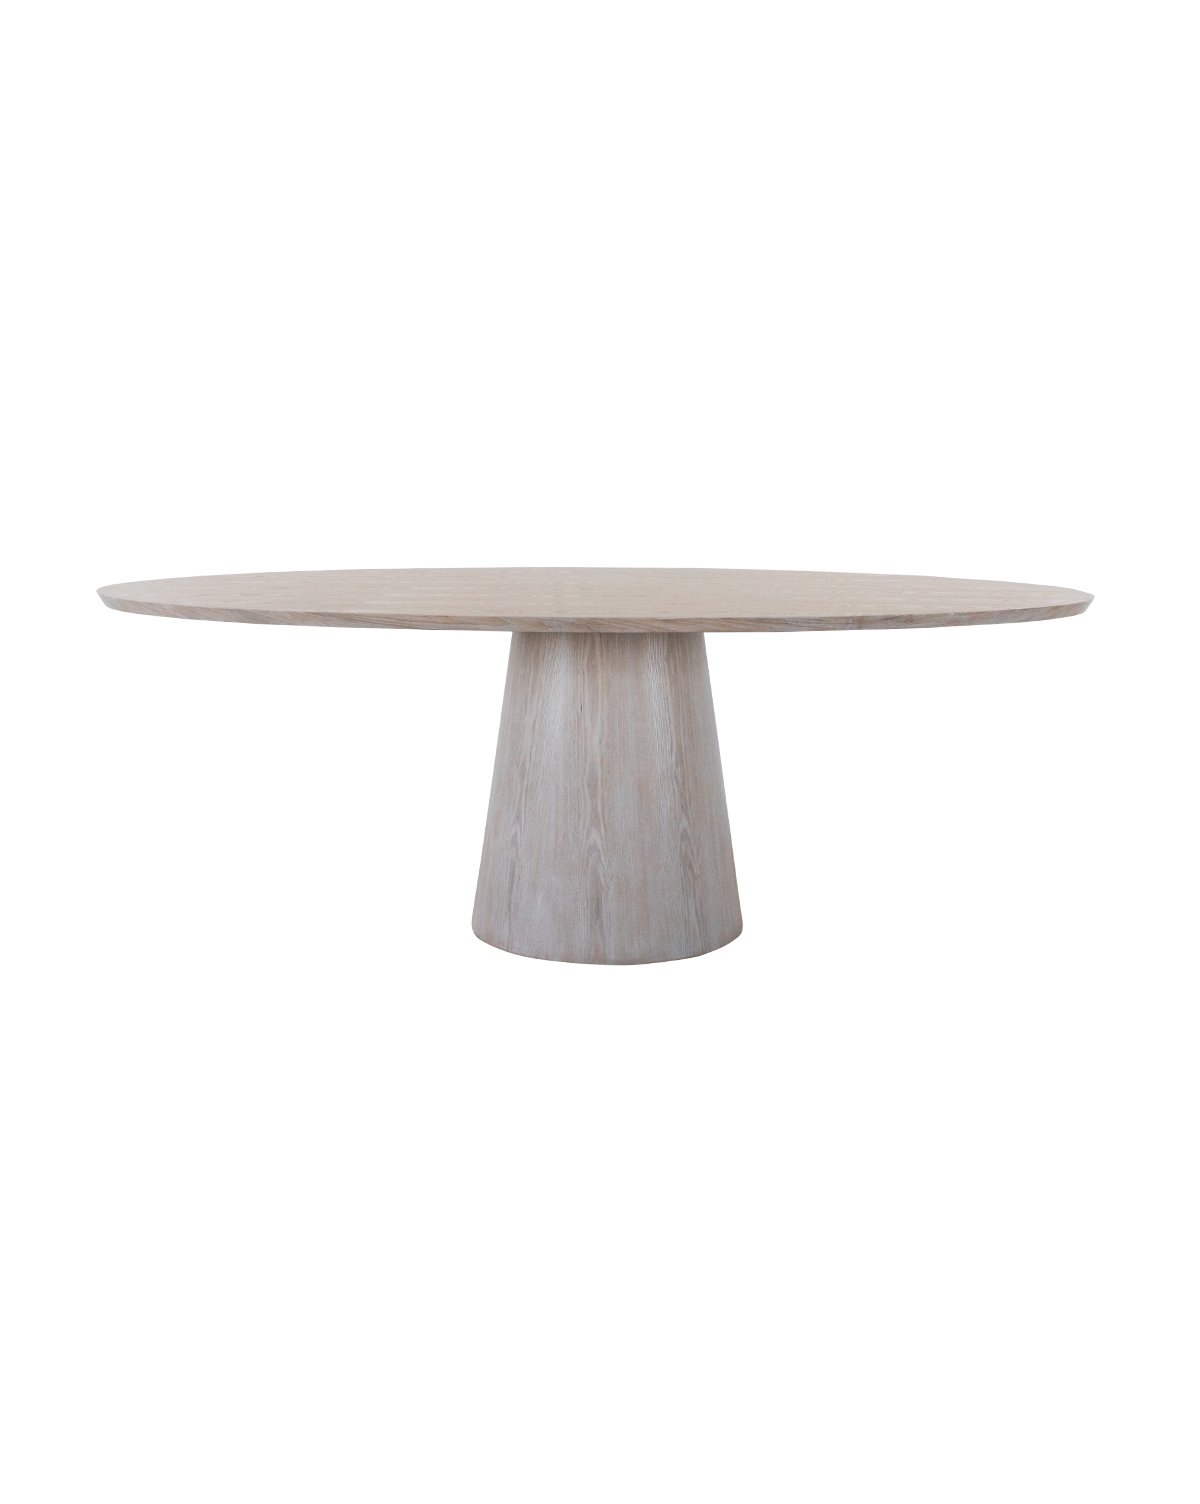 Preston_Oval_Dining_Table_1.jpg